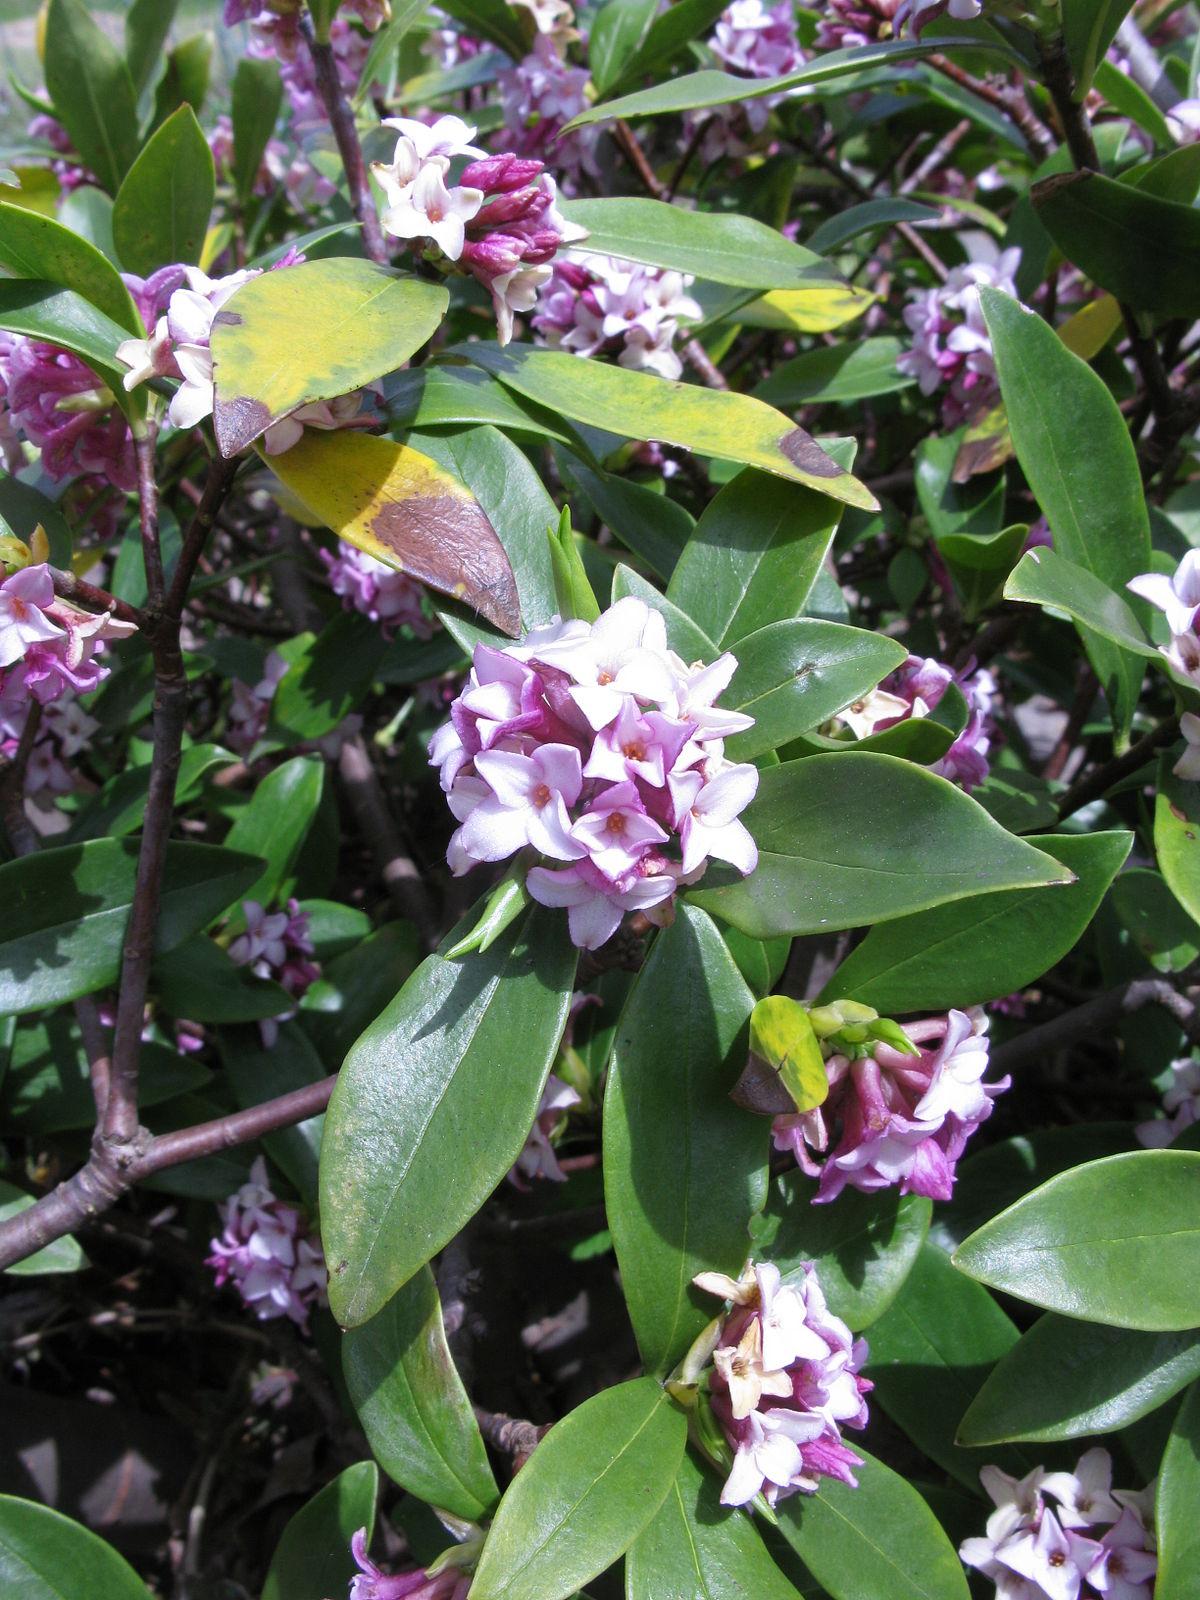 Daphne odora wikip dia for Arbuste daphne odora aureomarginata